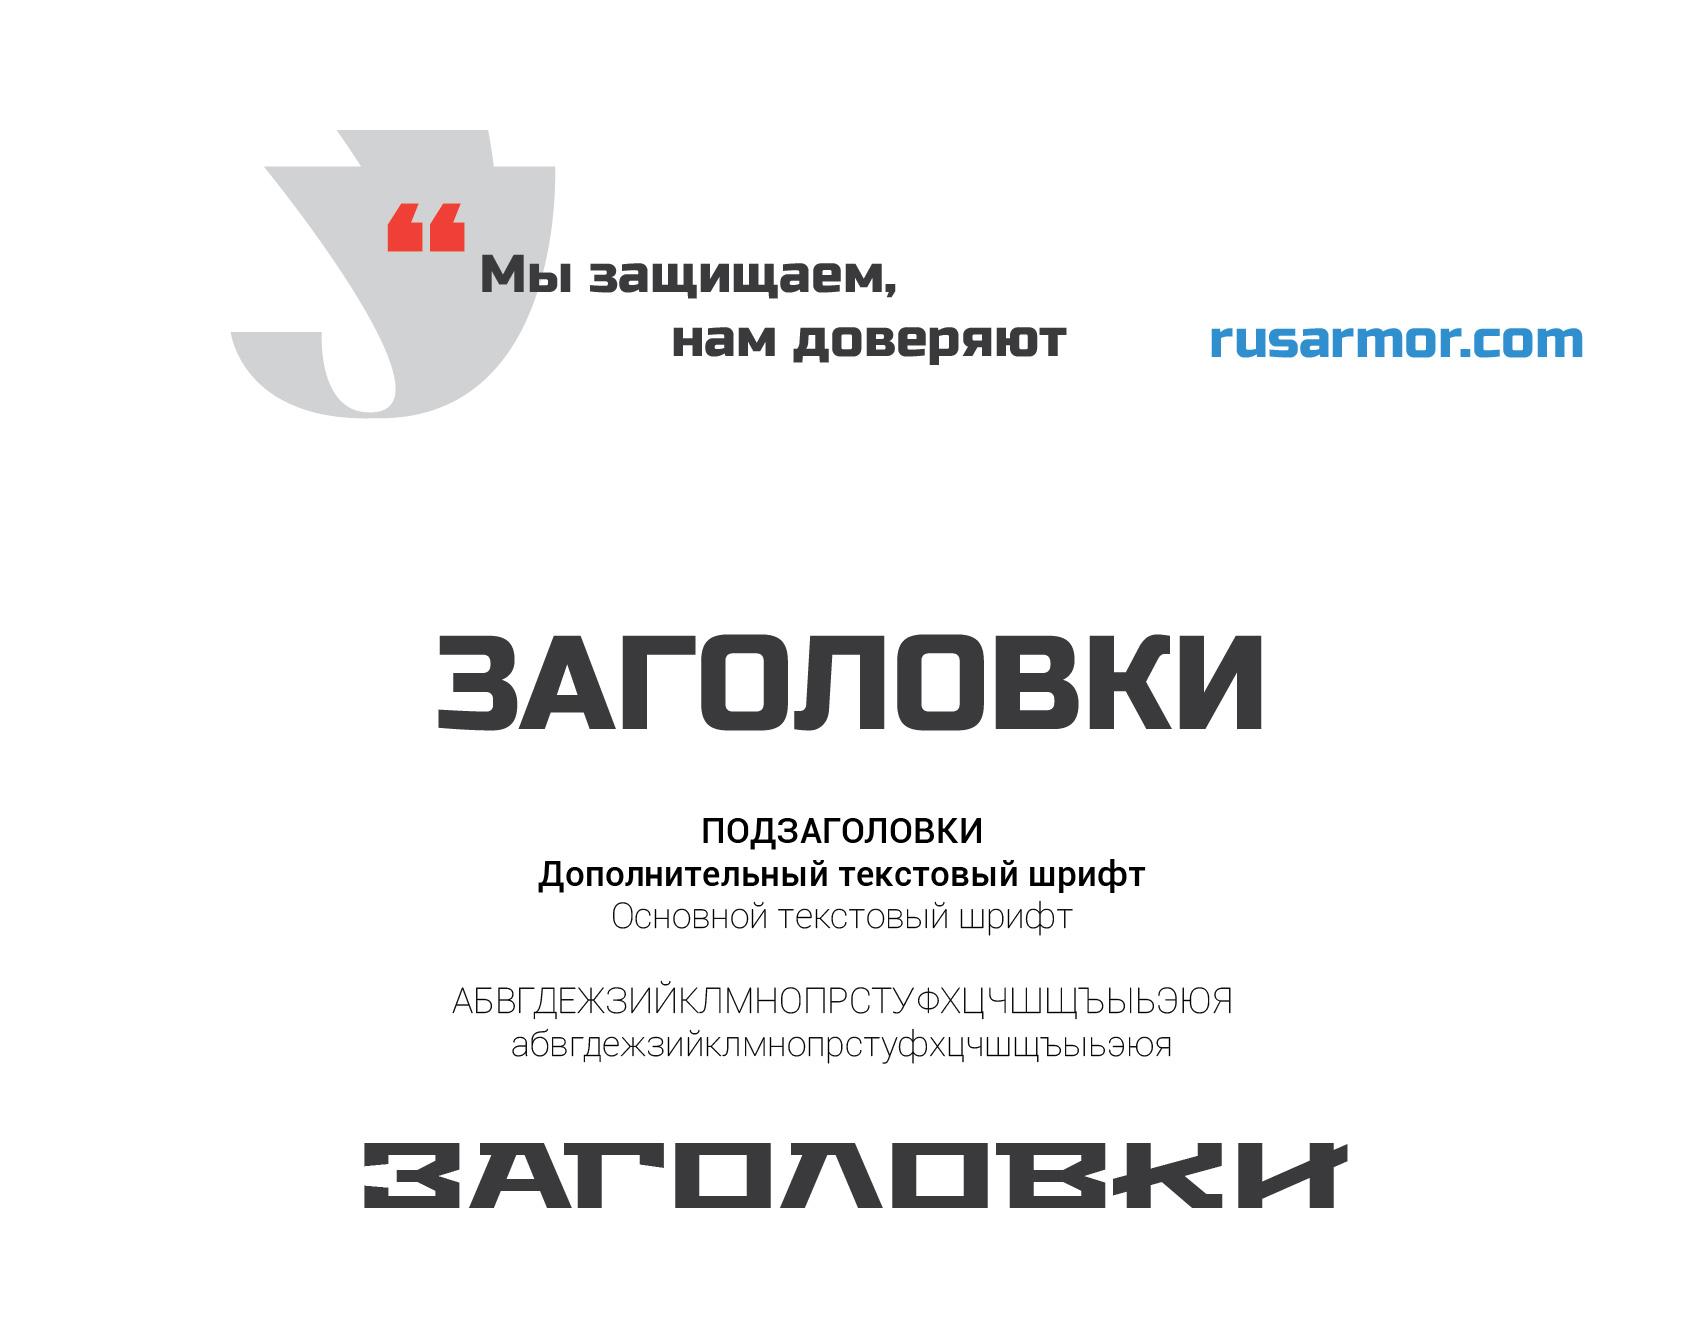 Разработка логотипа технологического стартапа РУСАРМОР фото f_1855a0acc398a7ab.jpg